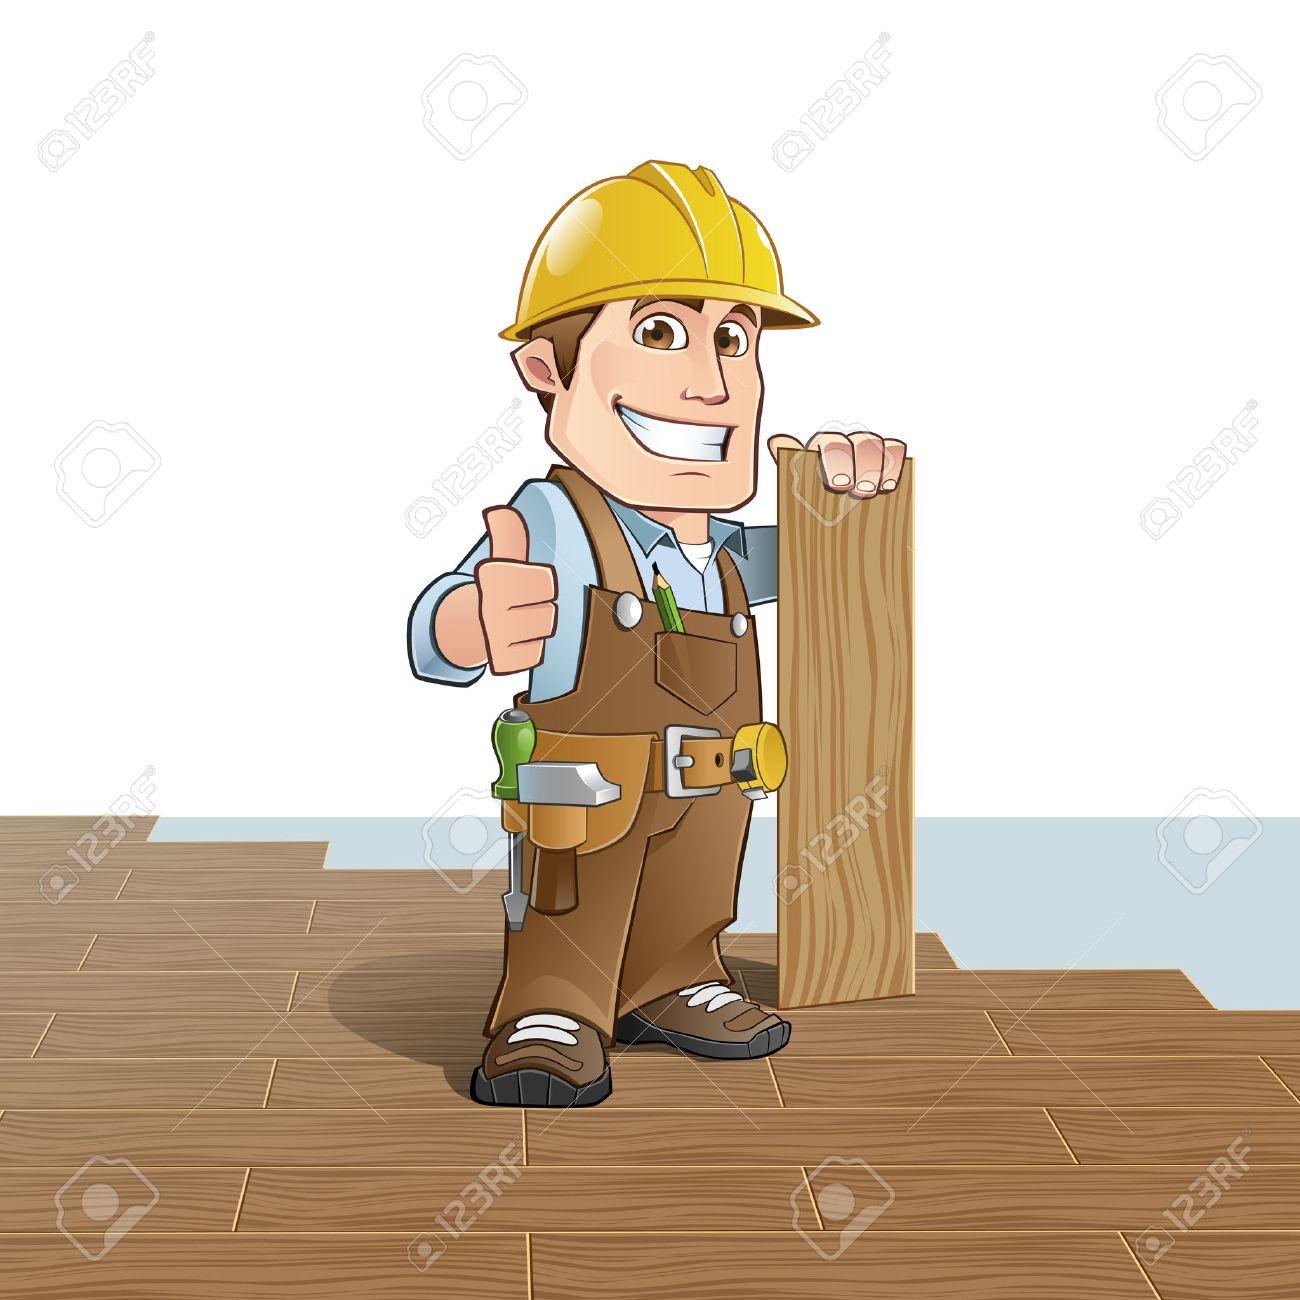 Carpenter installing wood flooring - 44067325